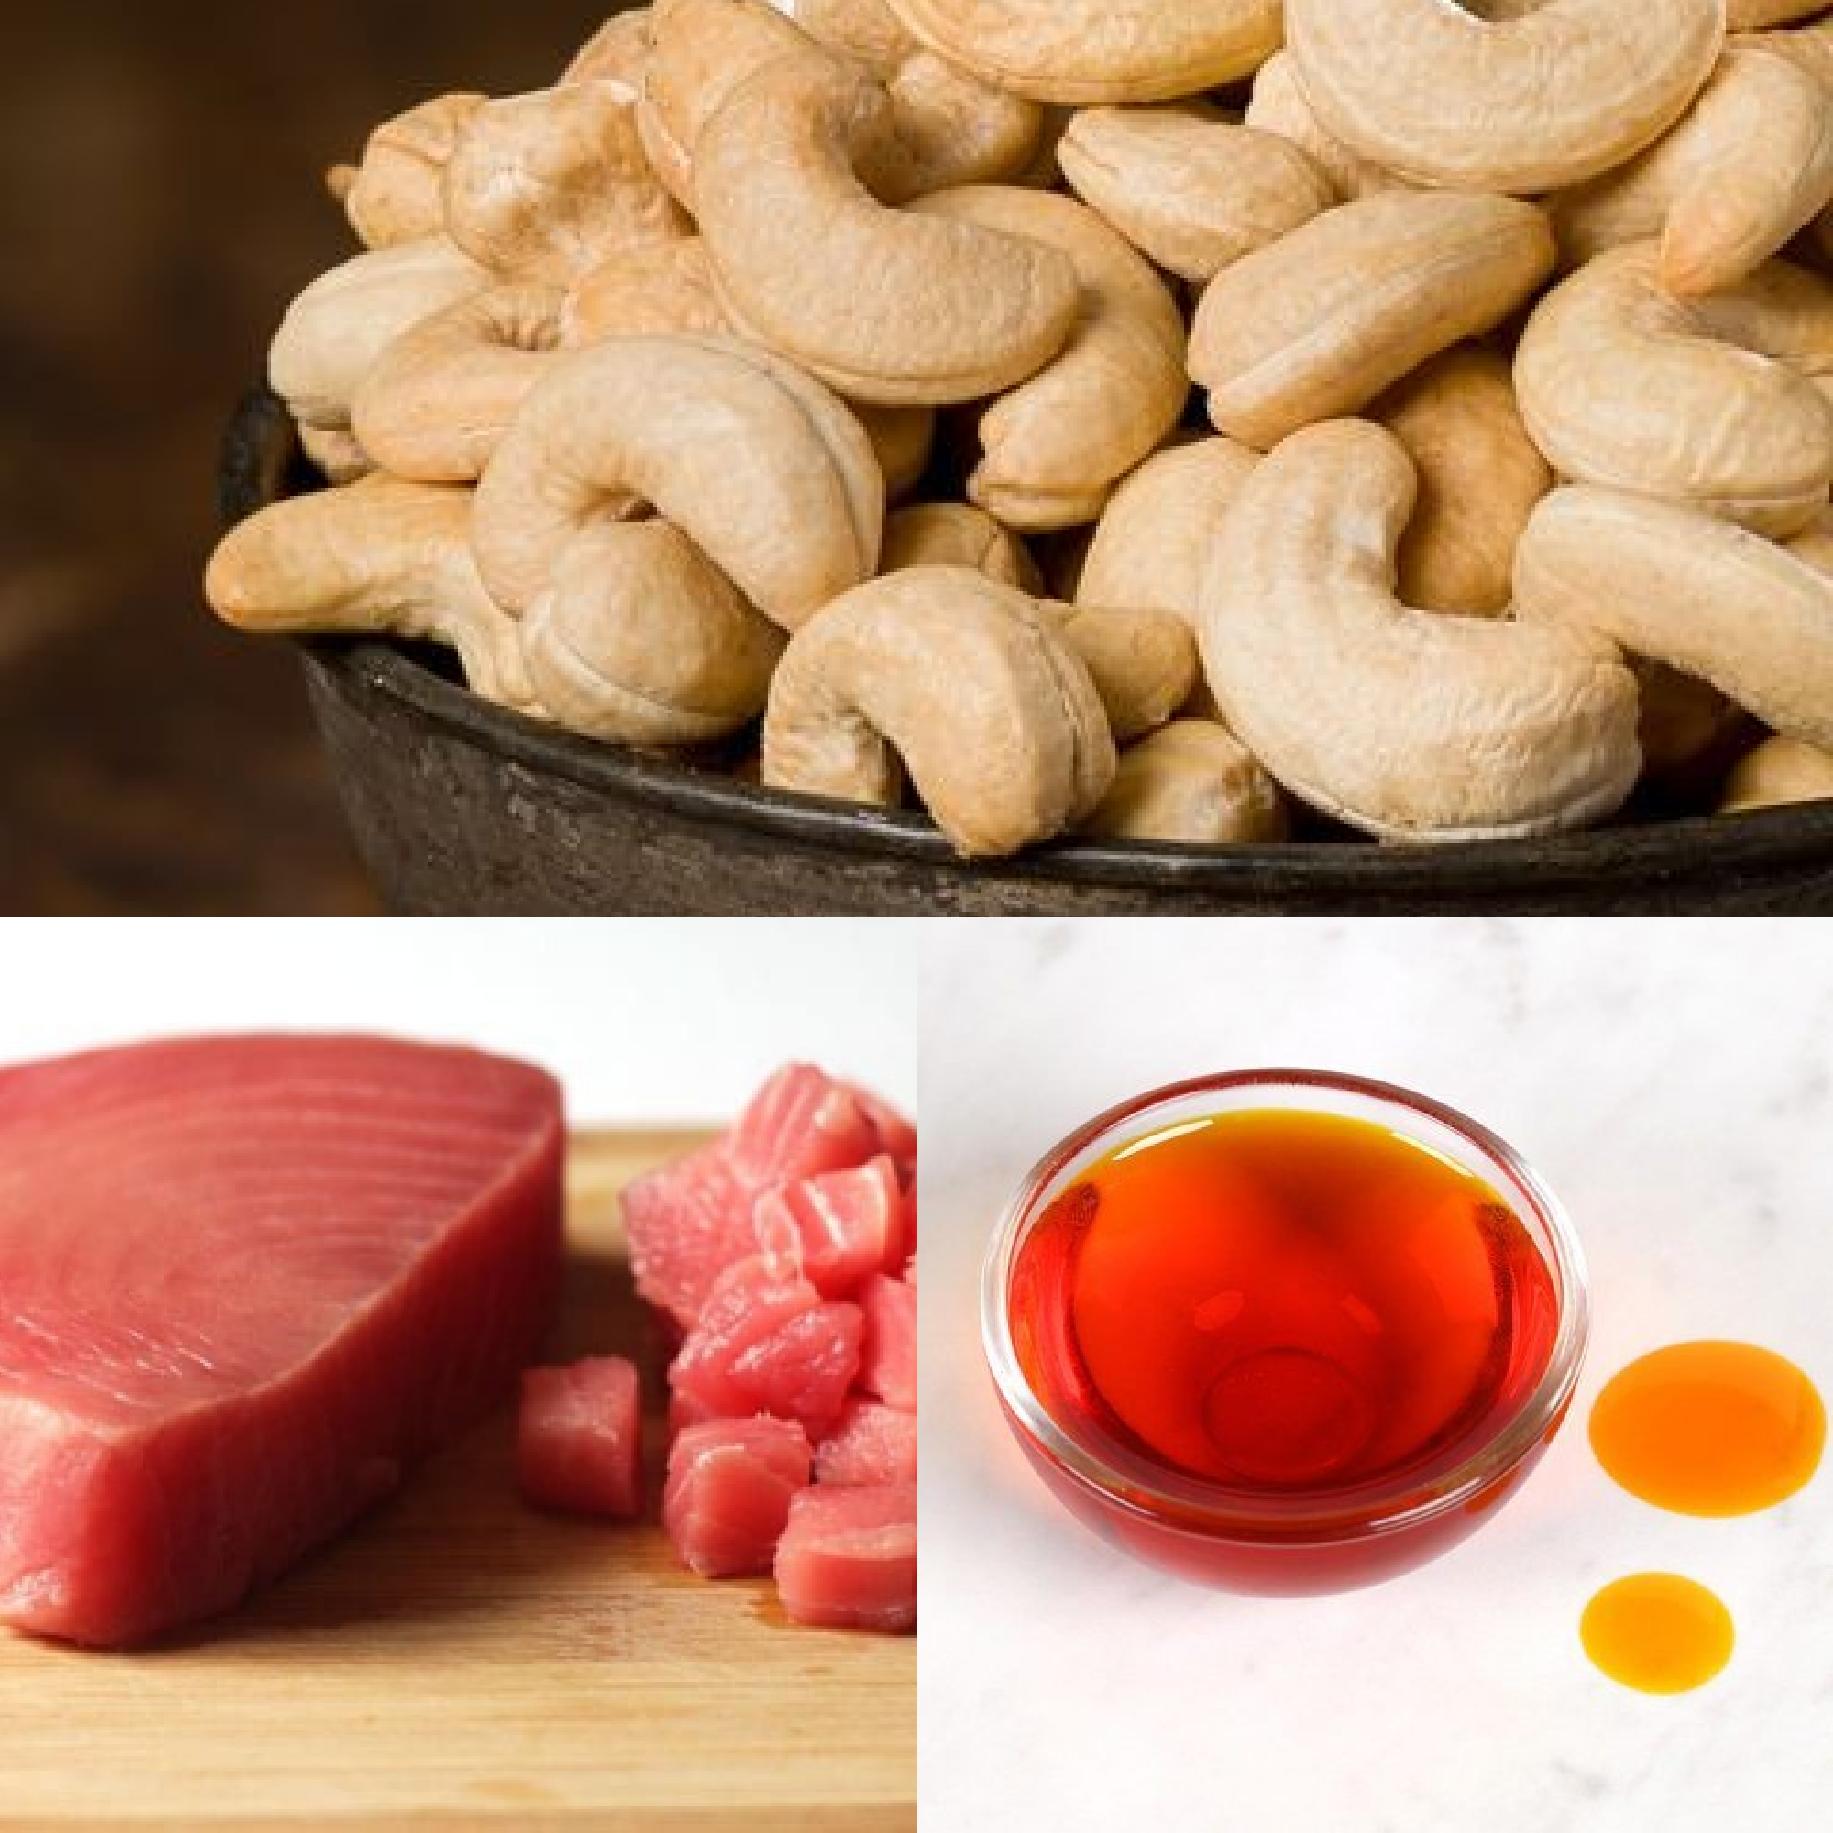 Tuna, cashew and plan oil